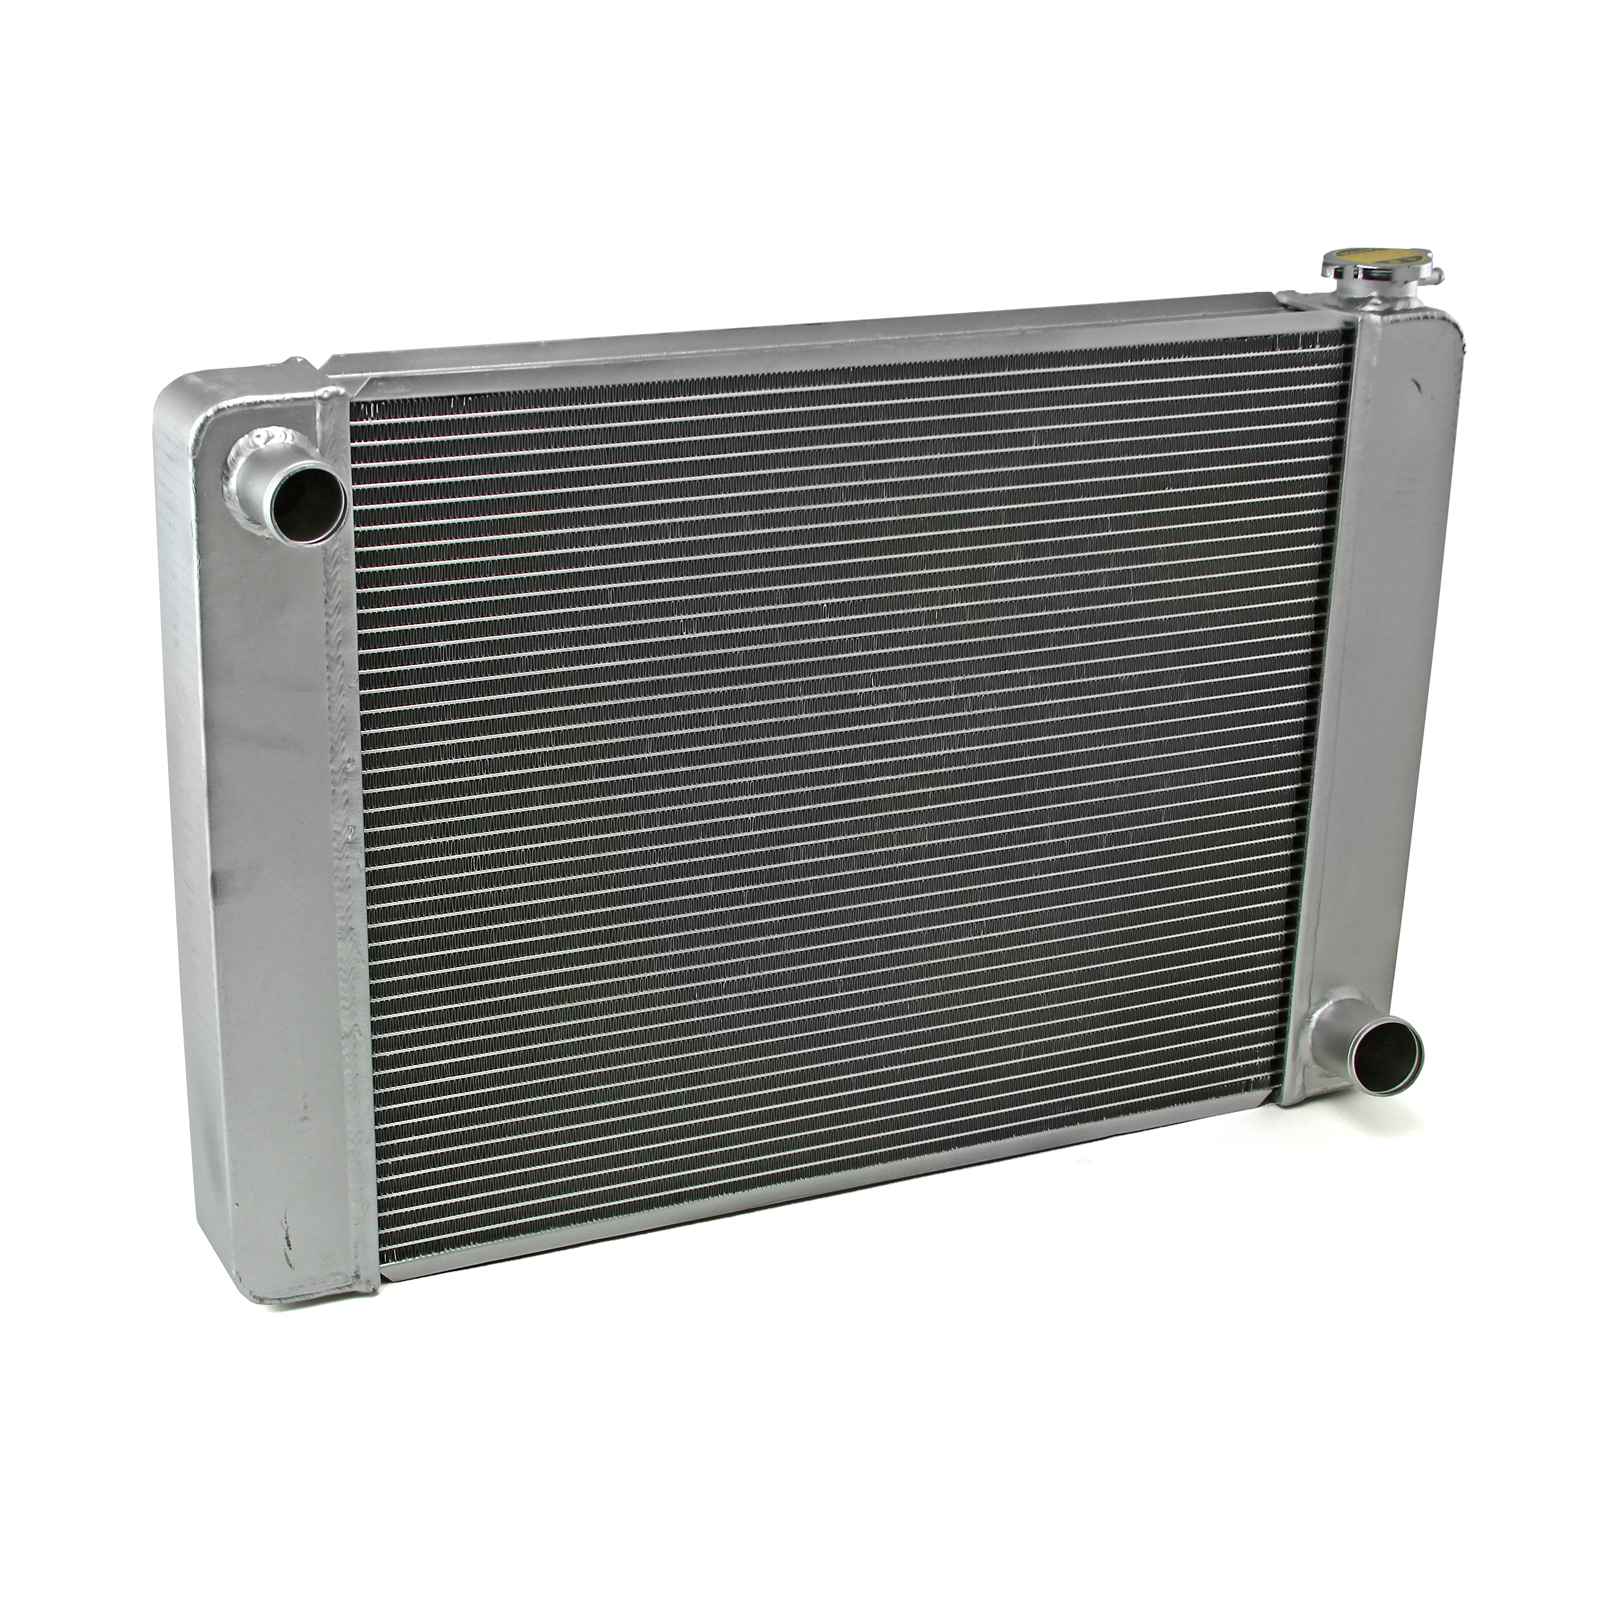 Ford Mopar 28x19x2.2 Aluminum Radiator (TR-BL O/L) Satin